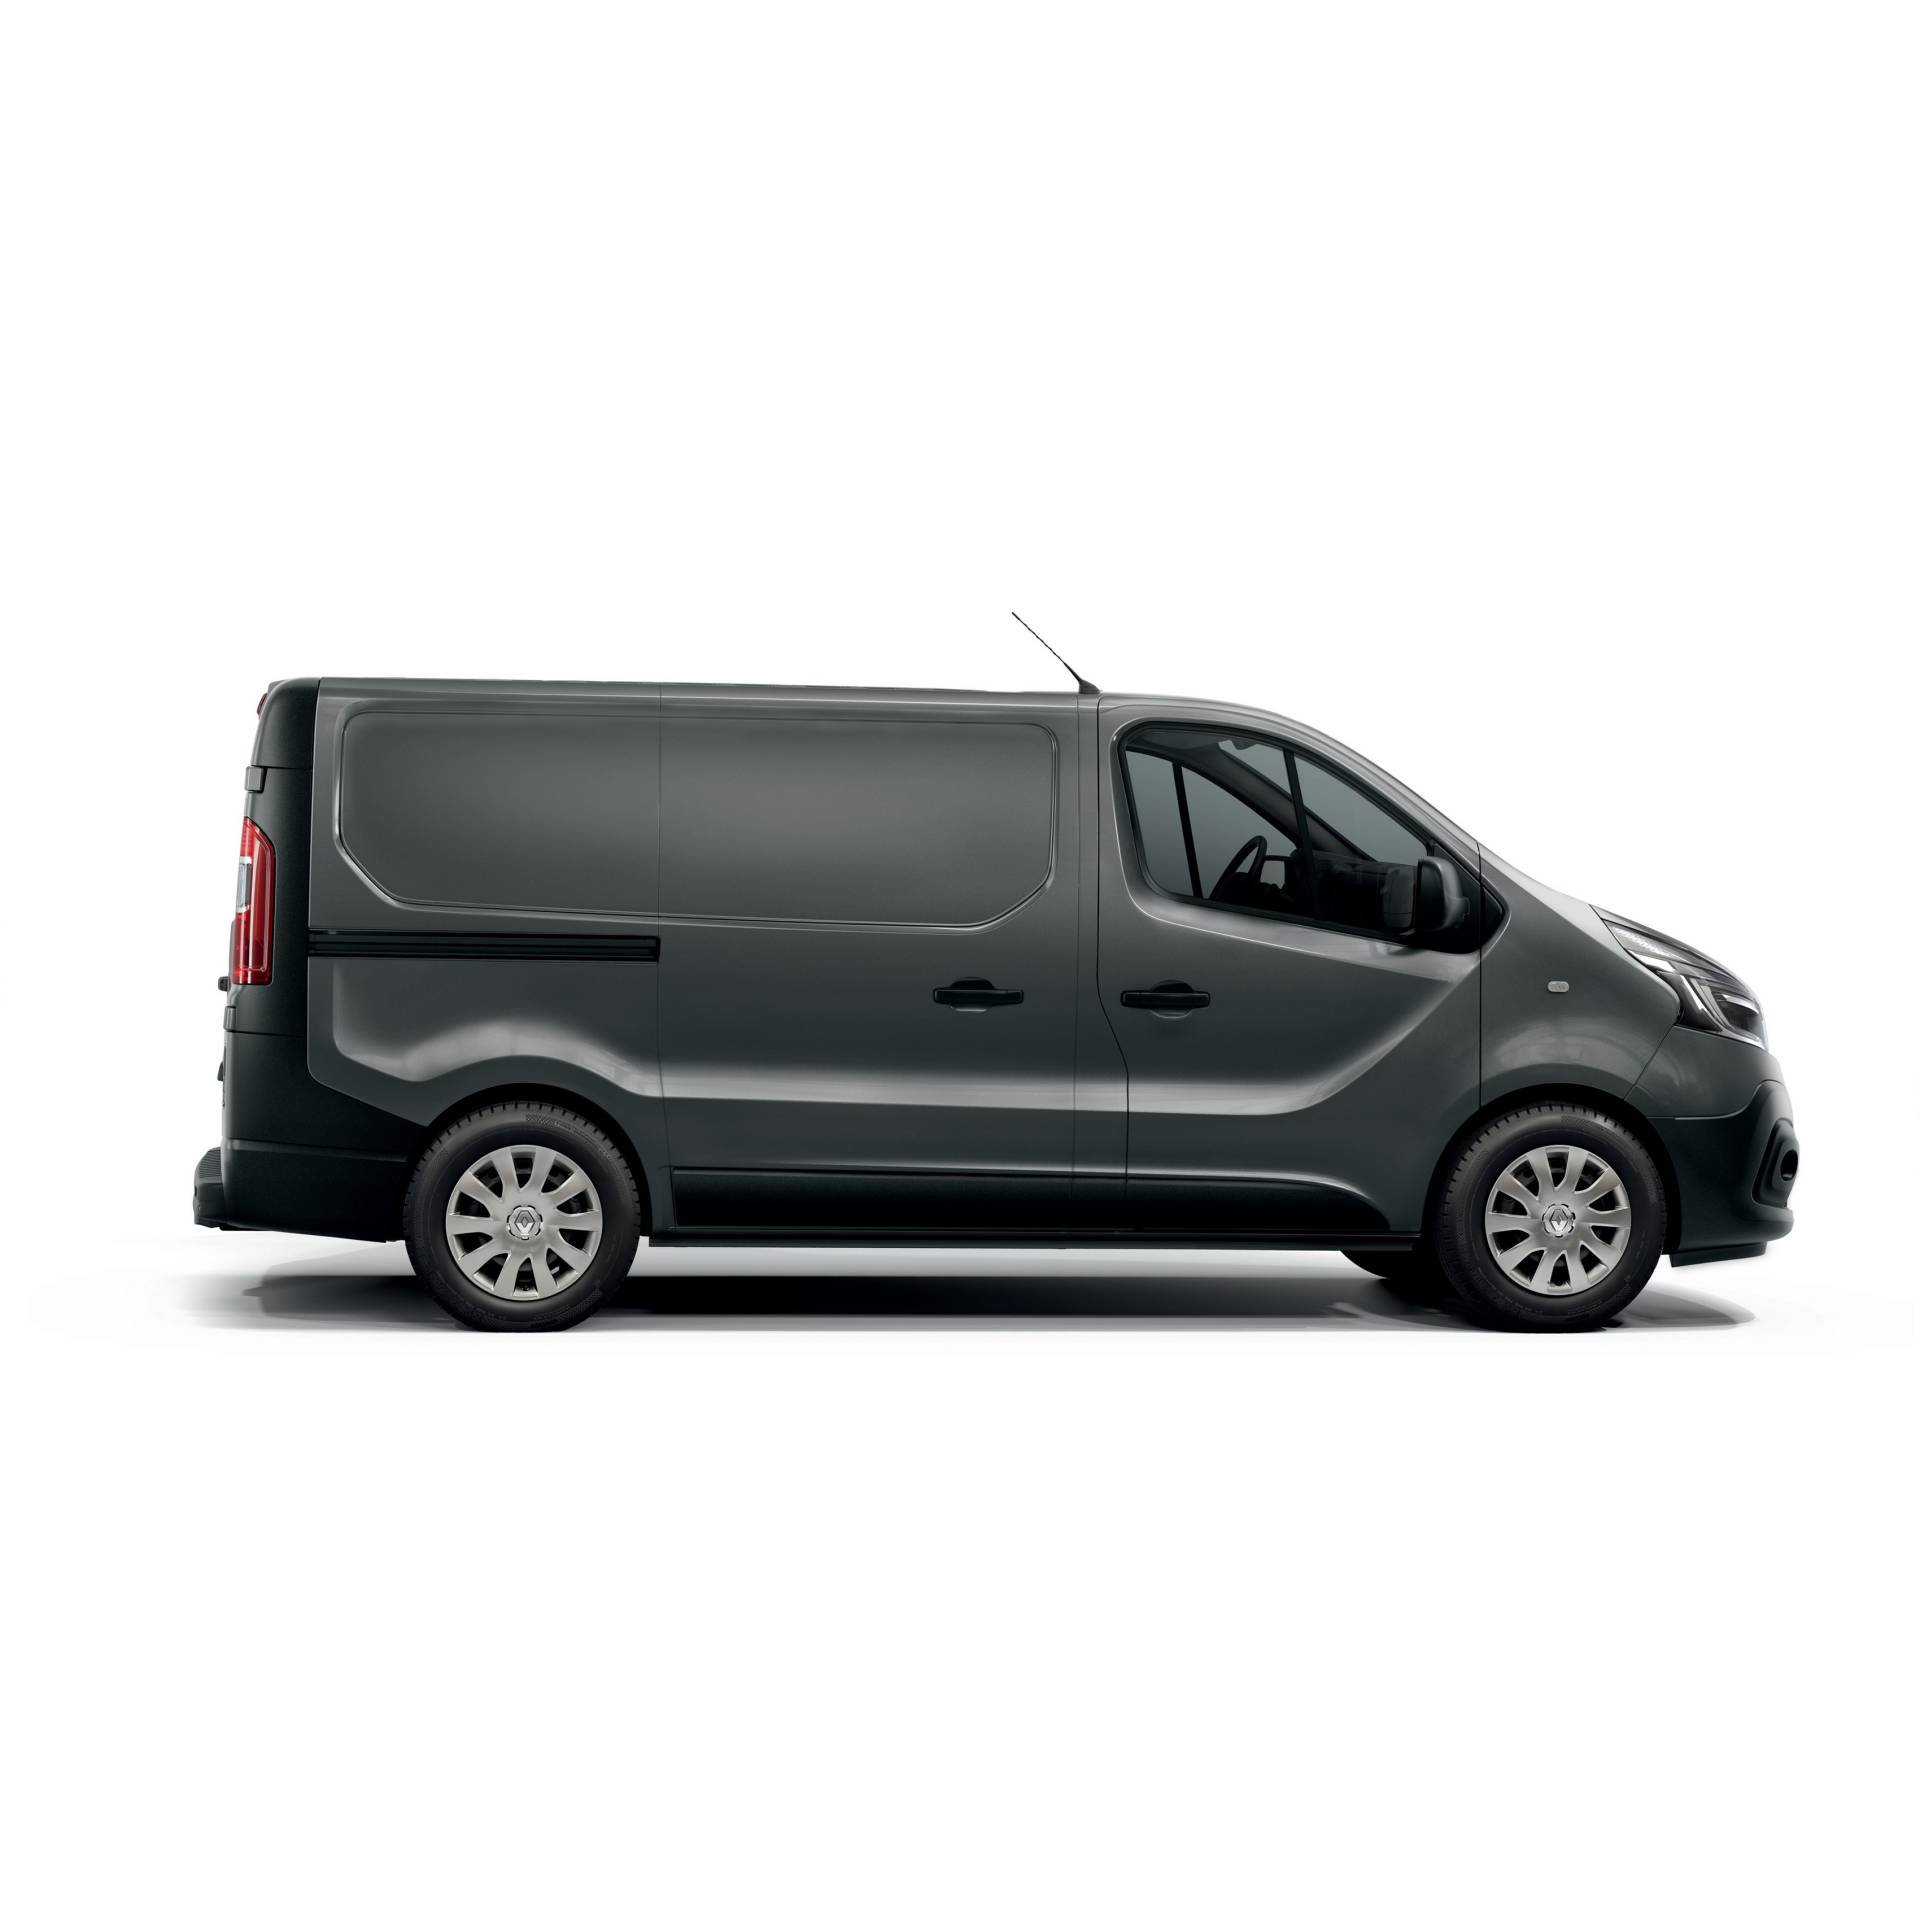 5bdceb7f-2019my-renault-trafic-van-facelift-6